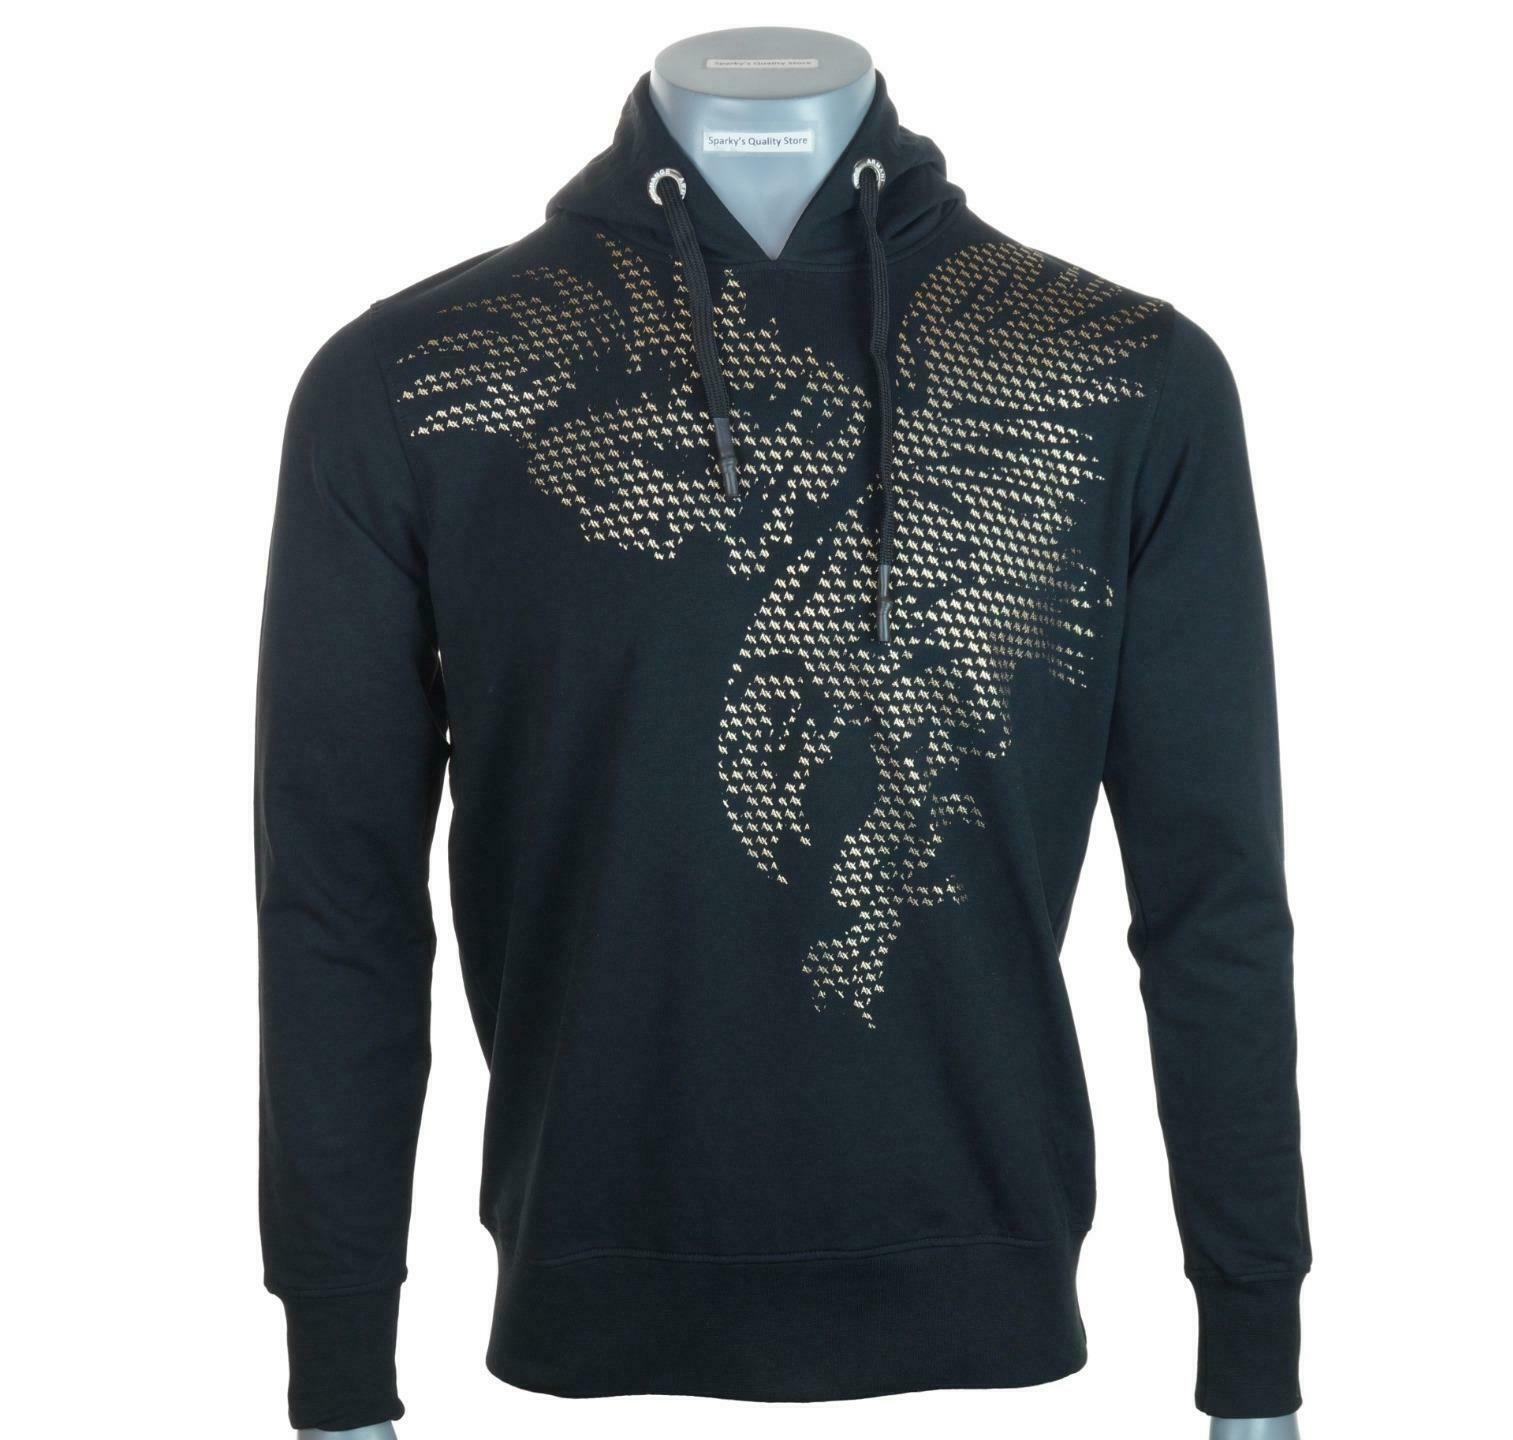 New Men's Authentic Armani Exchange Stretch Hoodie Gold Foil Print Black Eagle